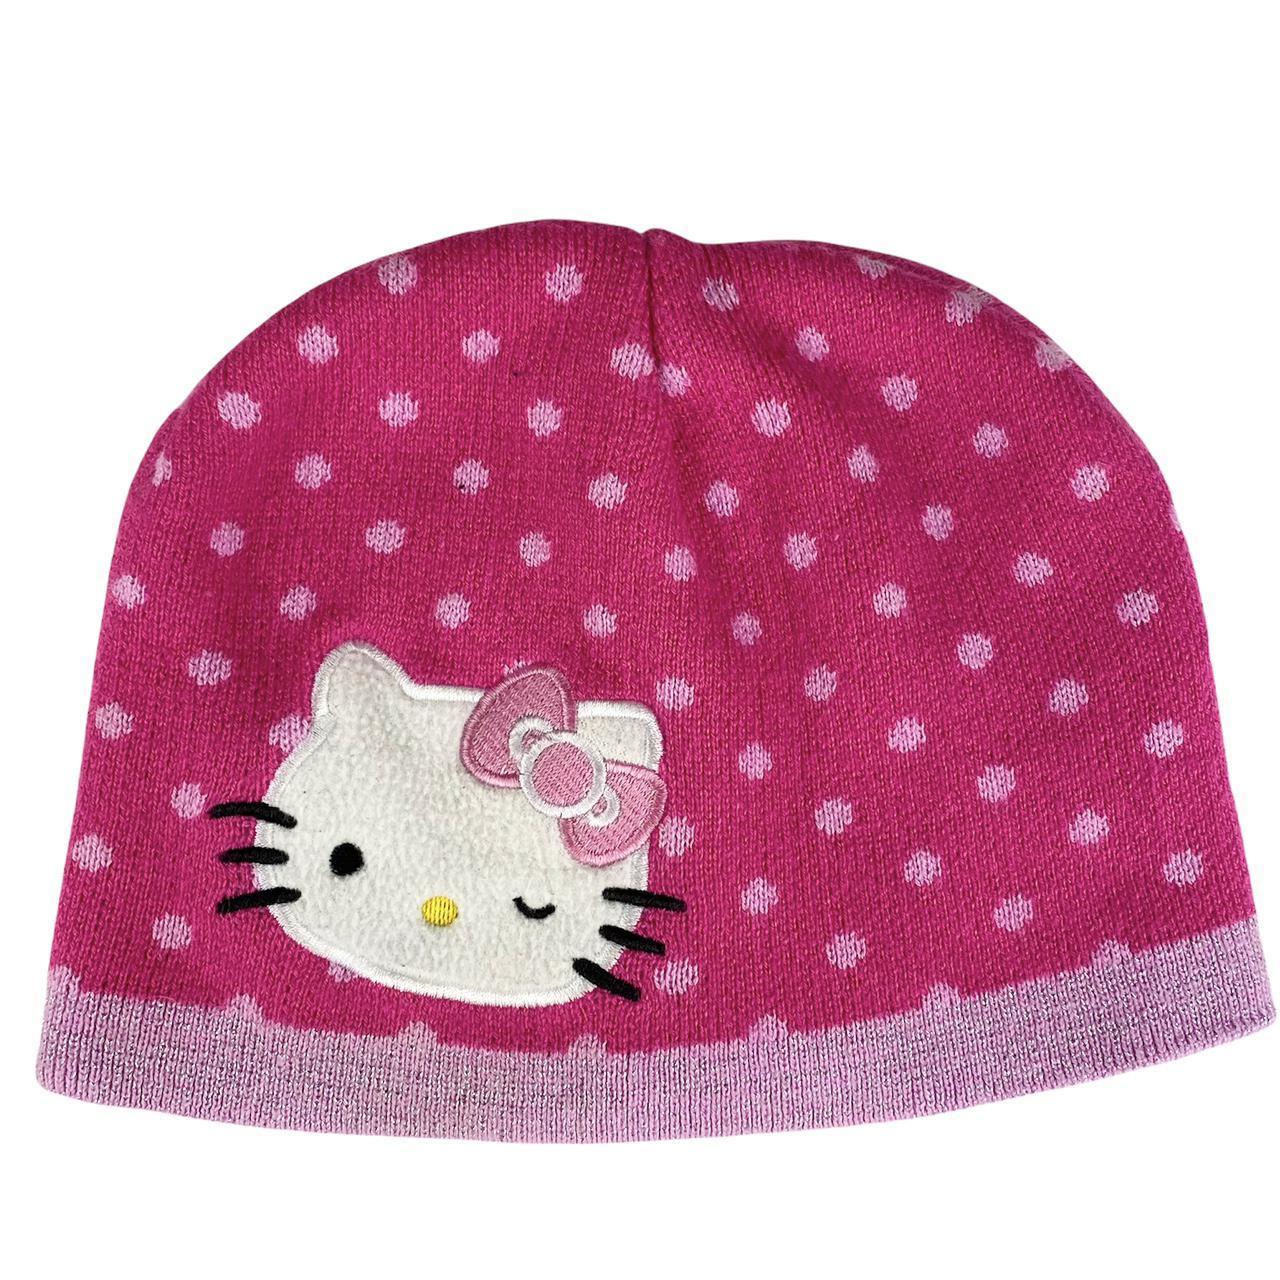 Product Image 1 - 🐱Polkadot Kitty beanie🐱 Pink Hello Kitty